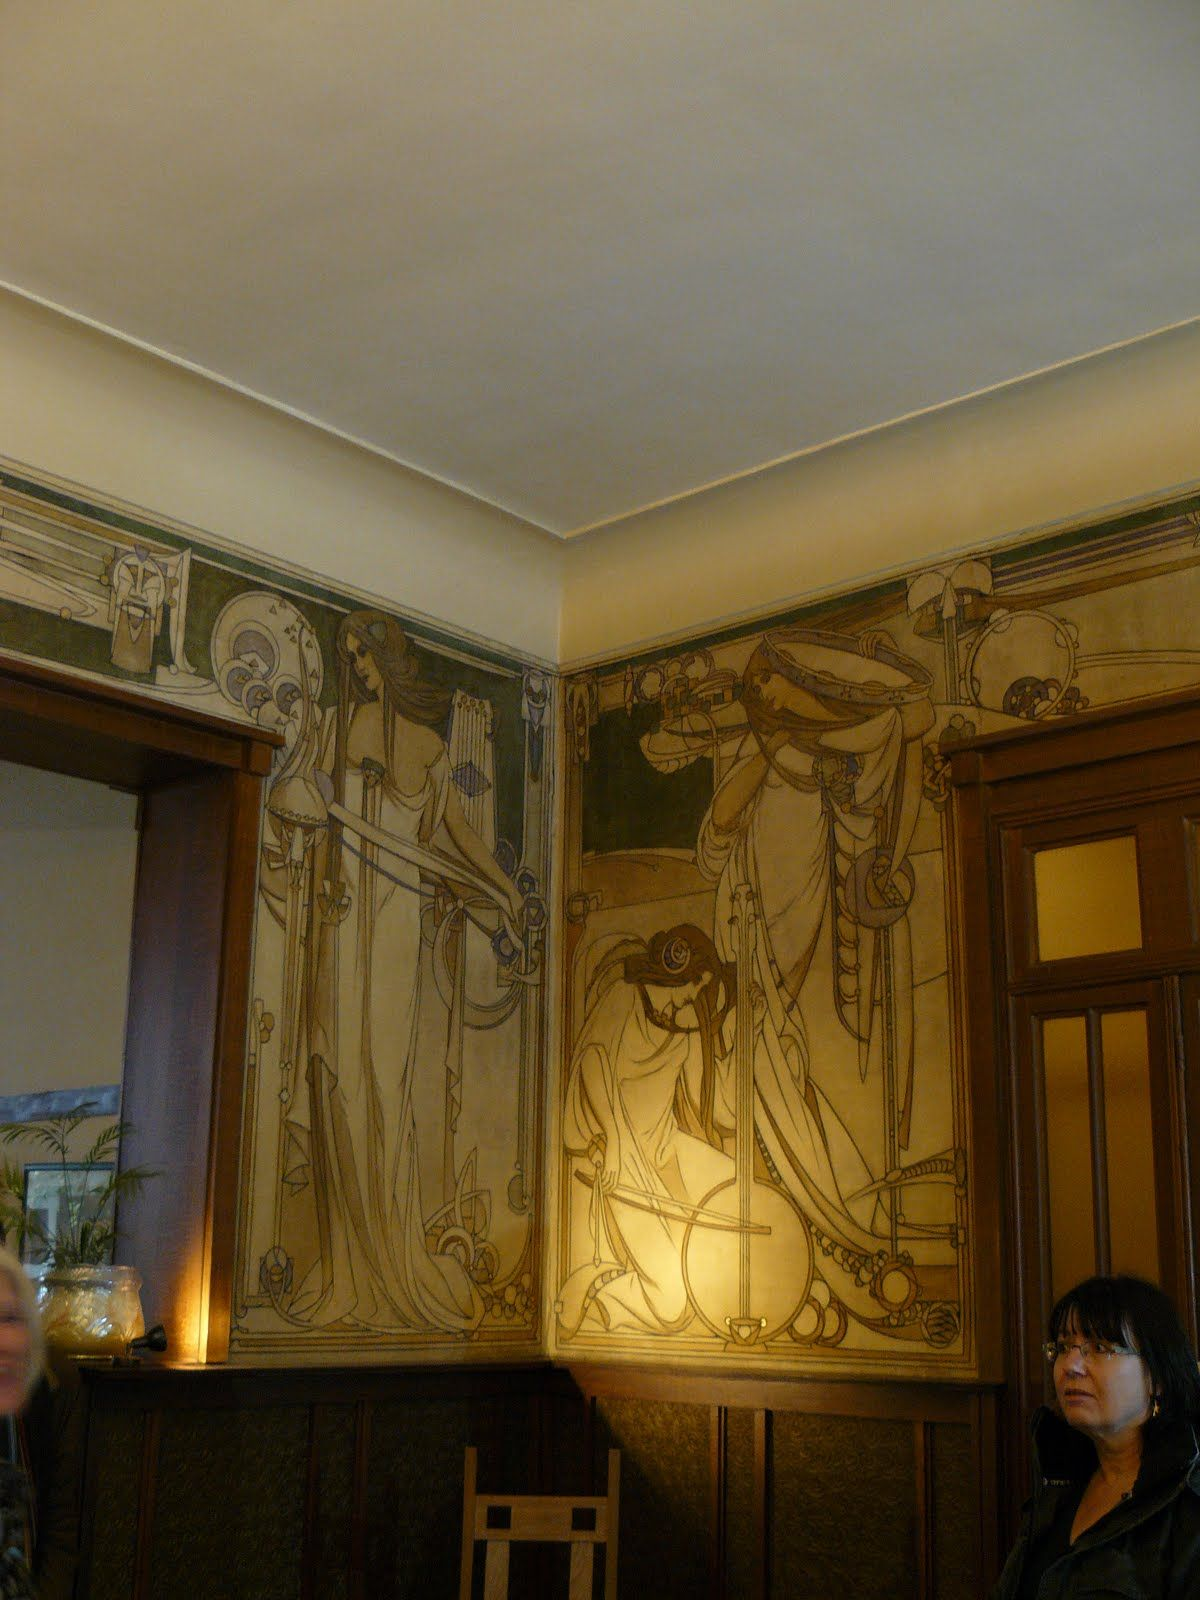 Amazing Art Nouveau Wall Mural Macintosh Mcnair Art Nouveau Interior Art Nouveau Decor Art Nouveau